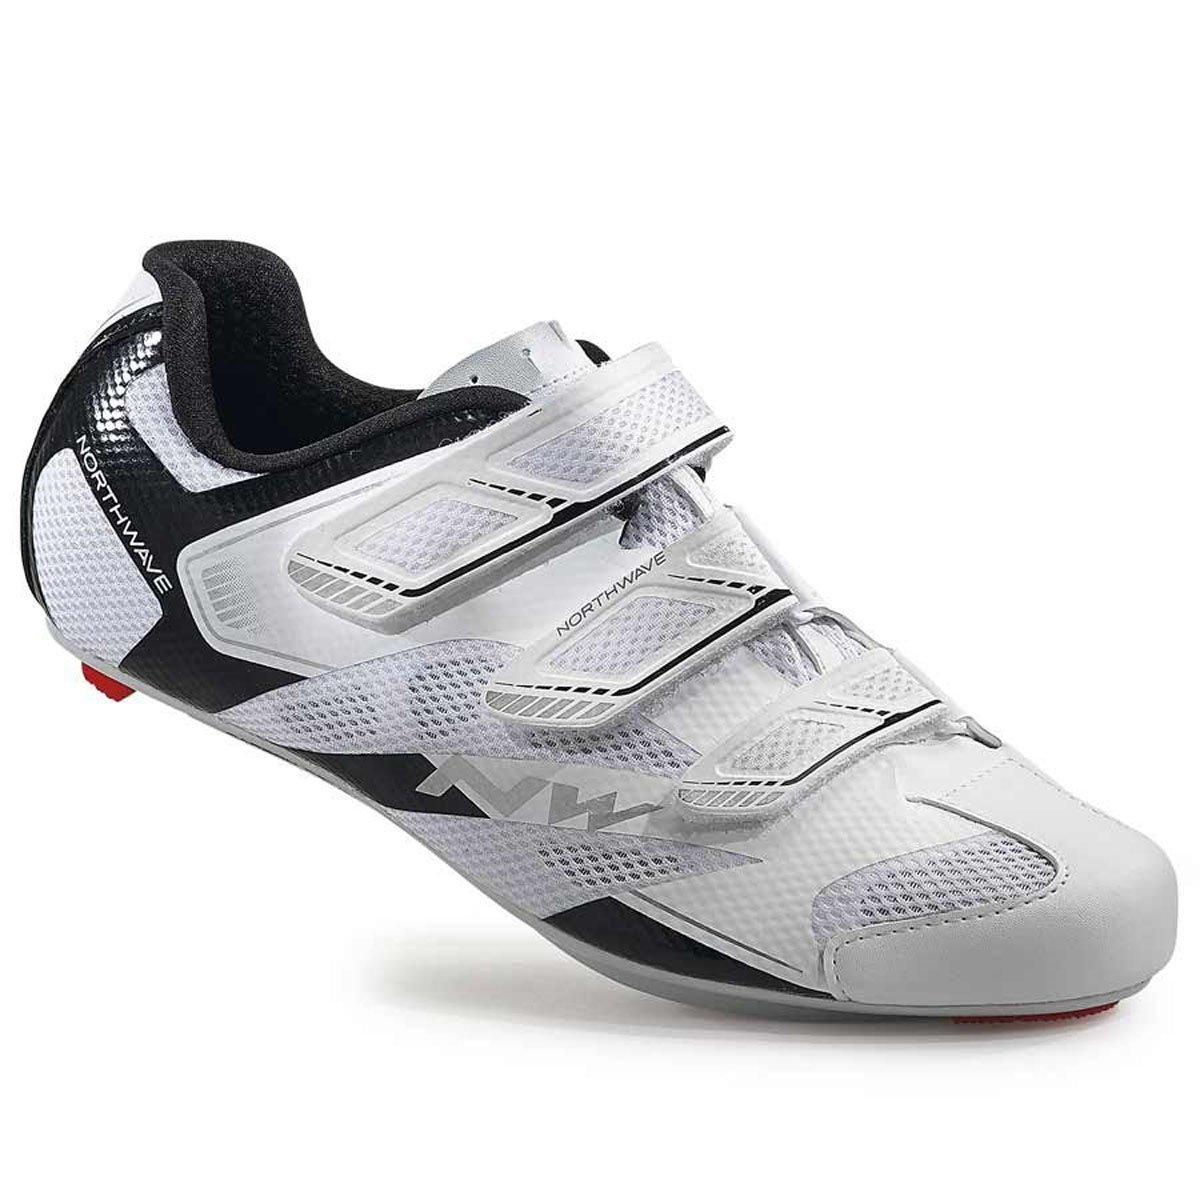 Northwave Sonic 2 Cycling Shoe 2016 B013FJ4F7G 40 White/Black